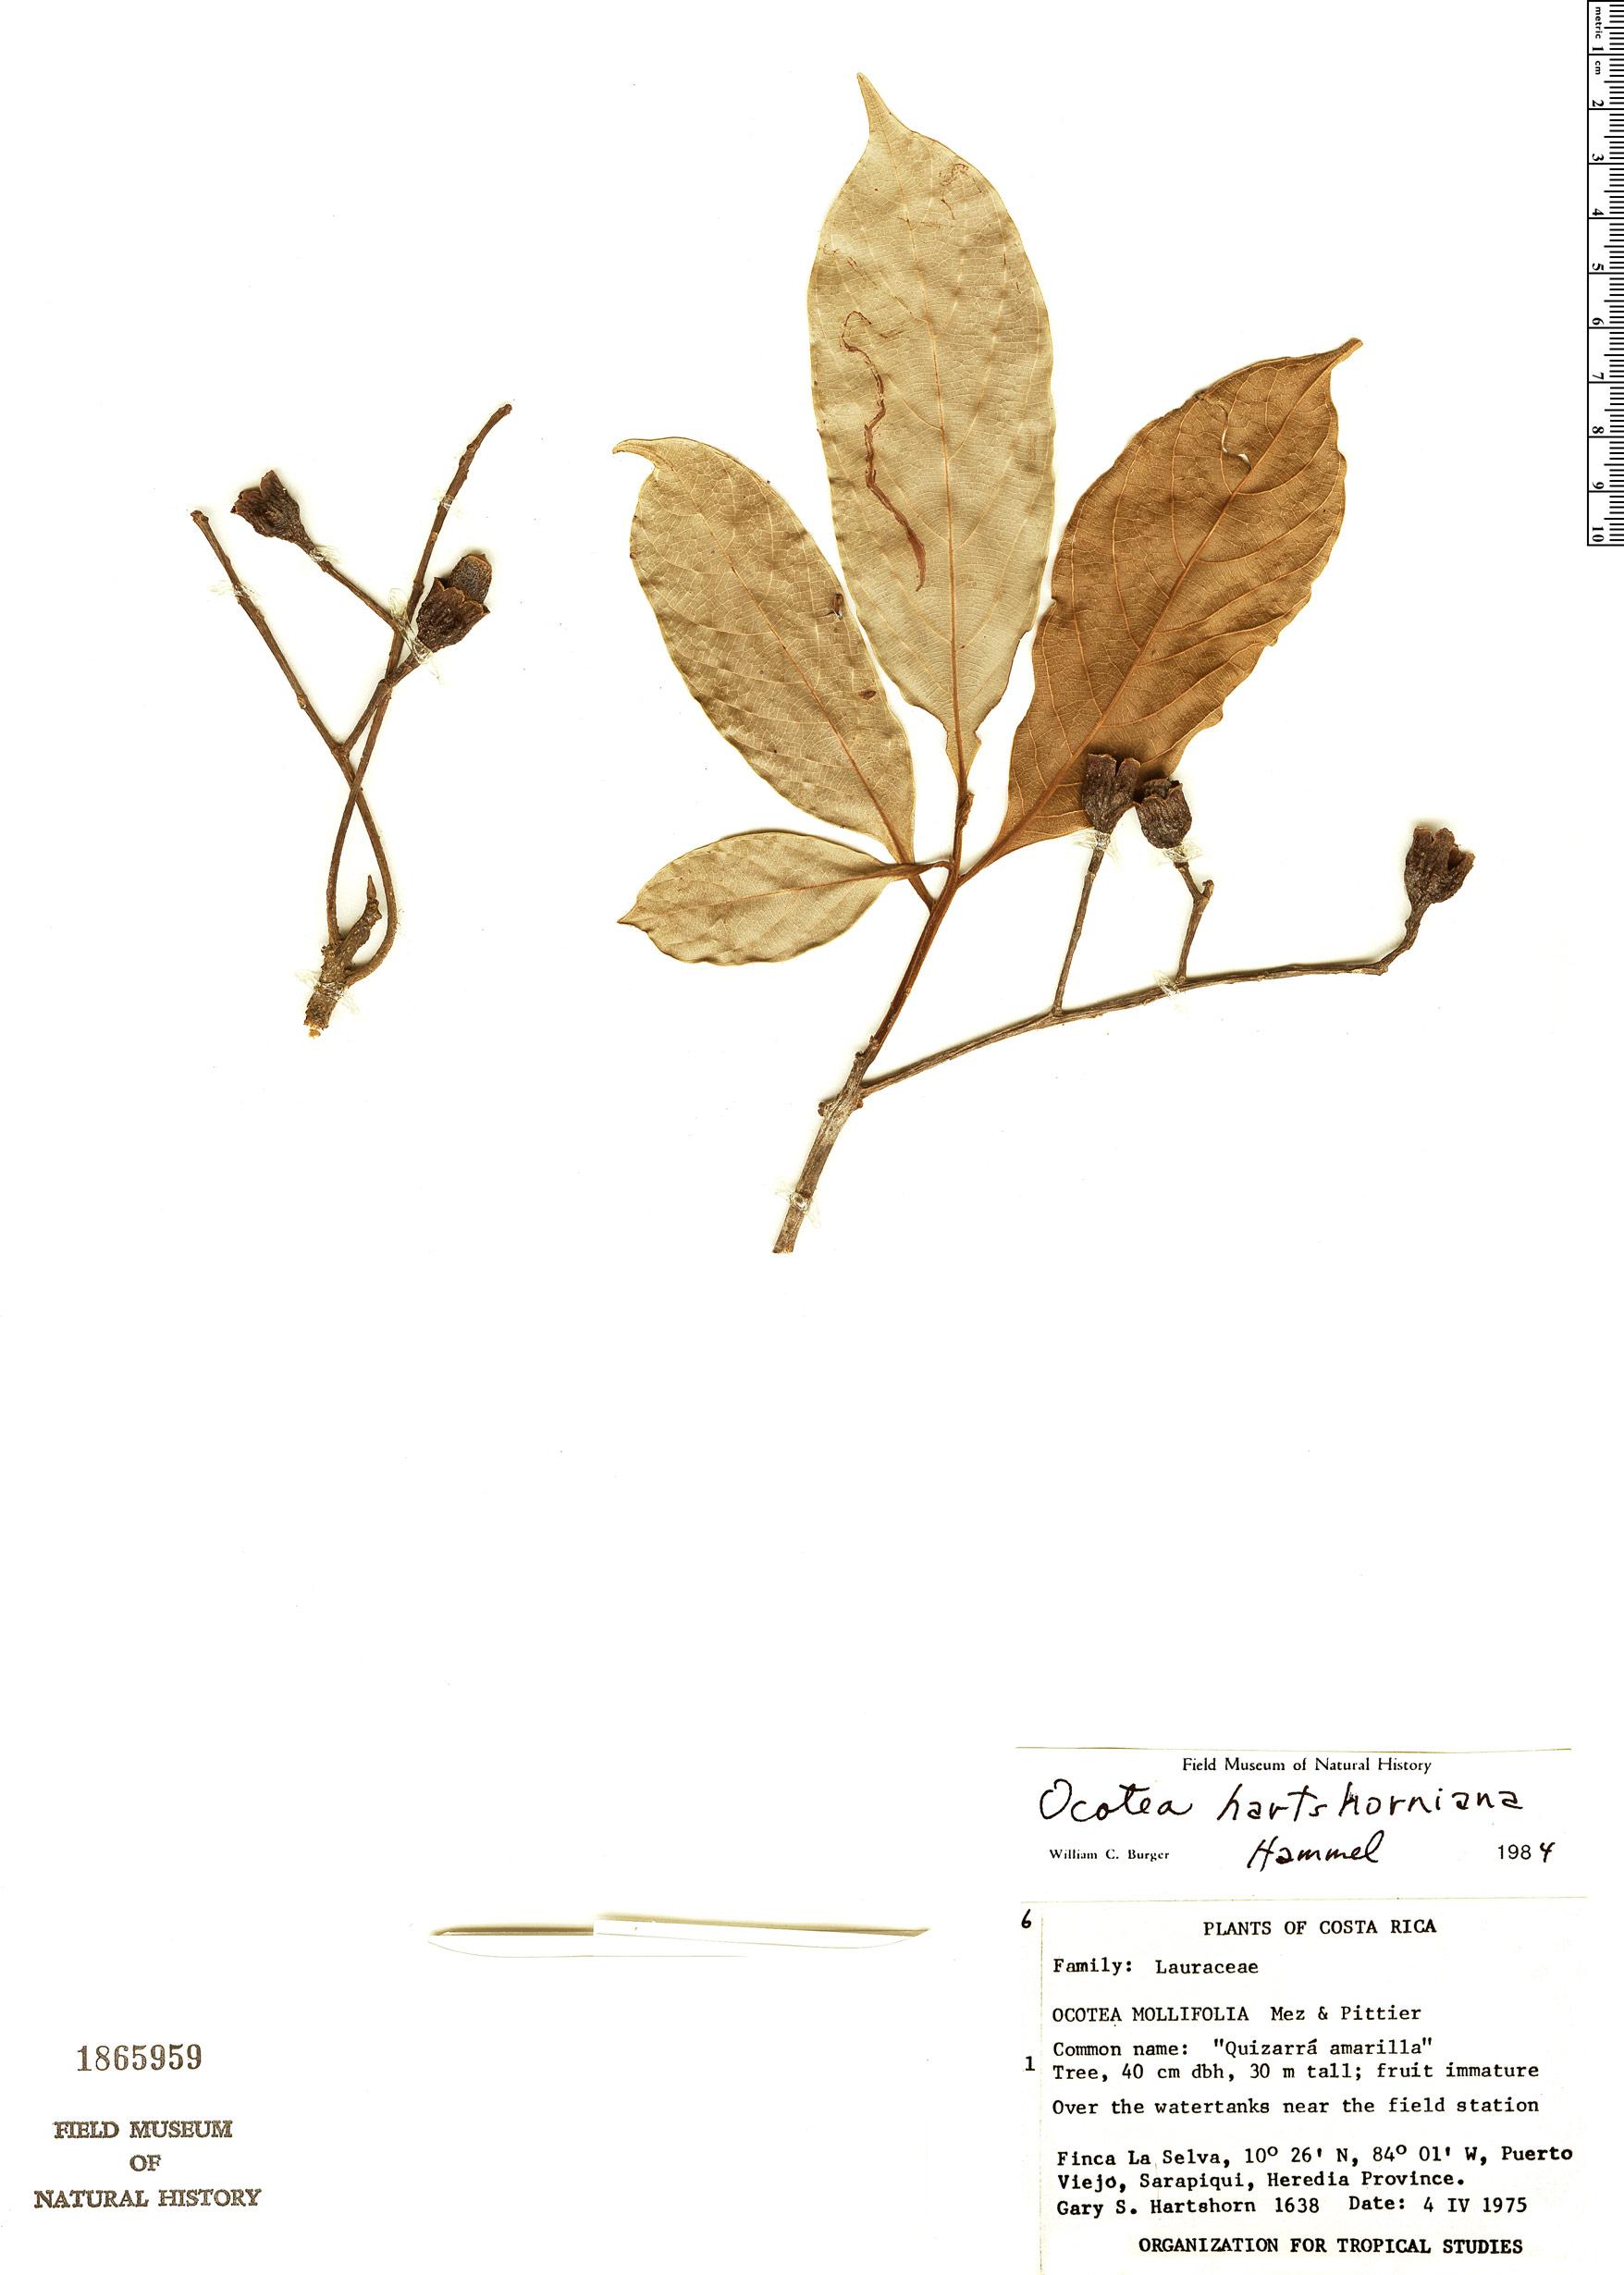 Specimen: Ocotea hartshorniana